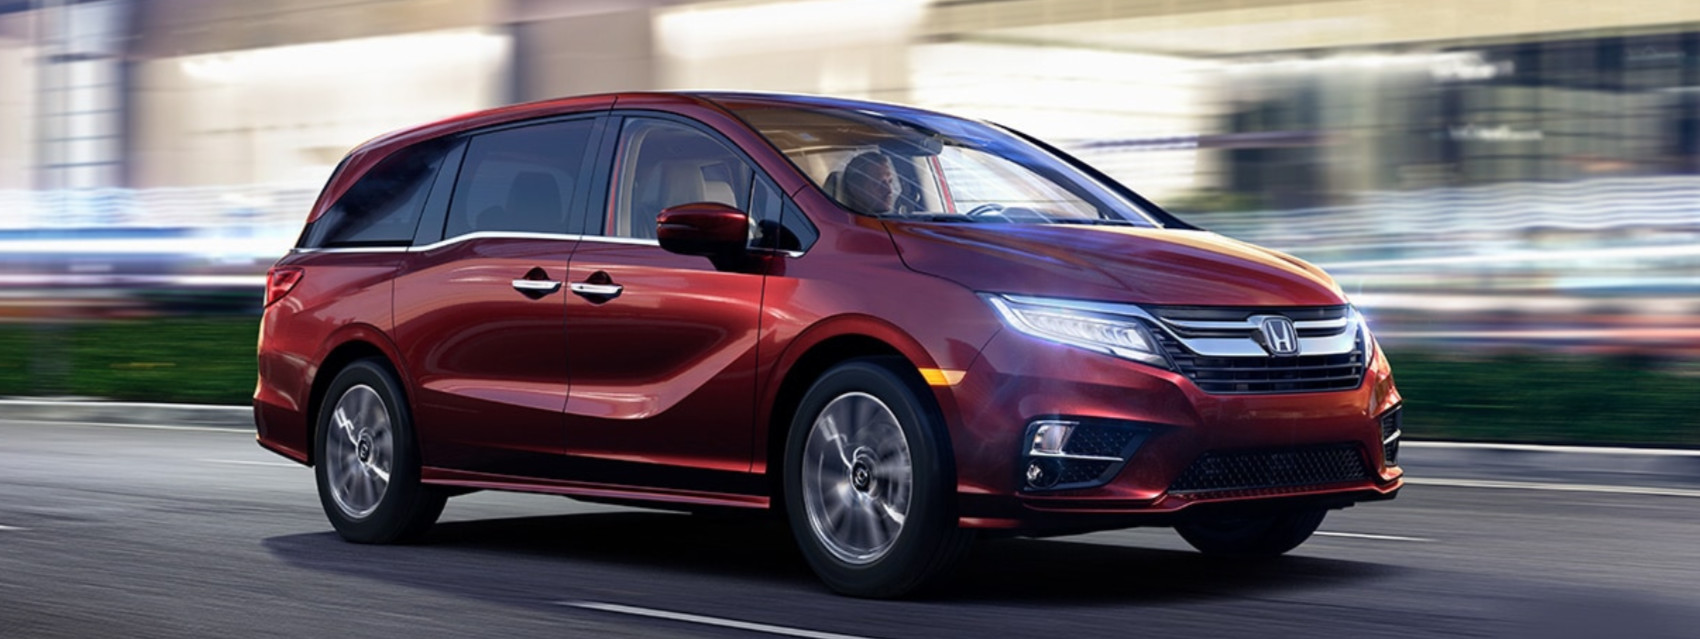 2020 Honda Odyssey Leasing near Humble, TX